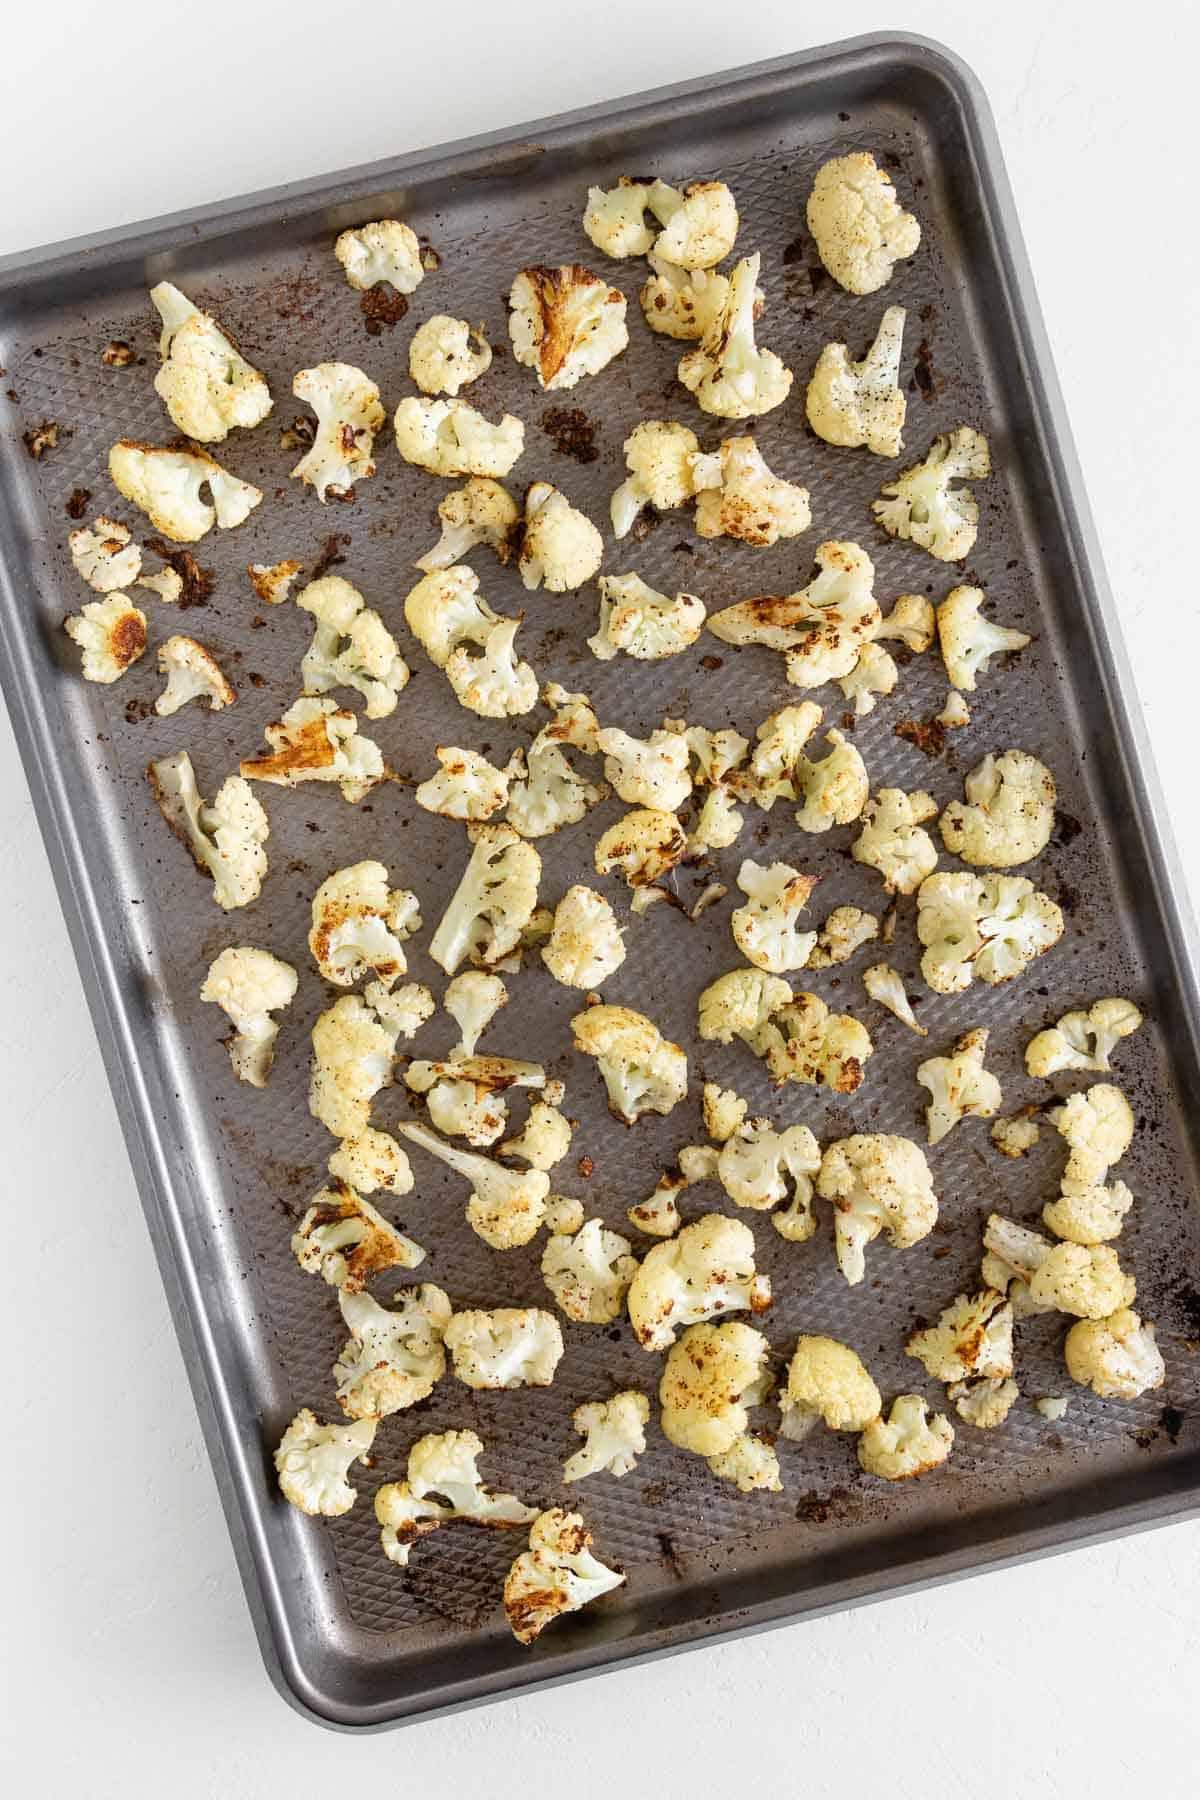 roasted cauliflower florets spread across a baking sheet